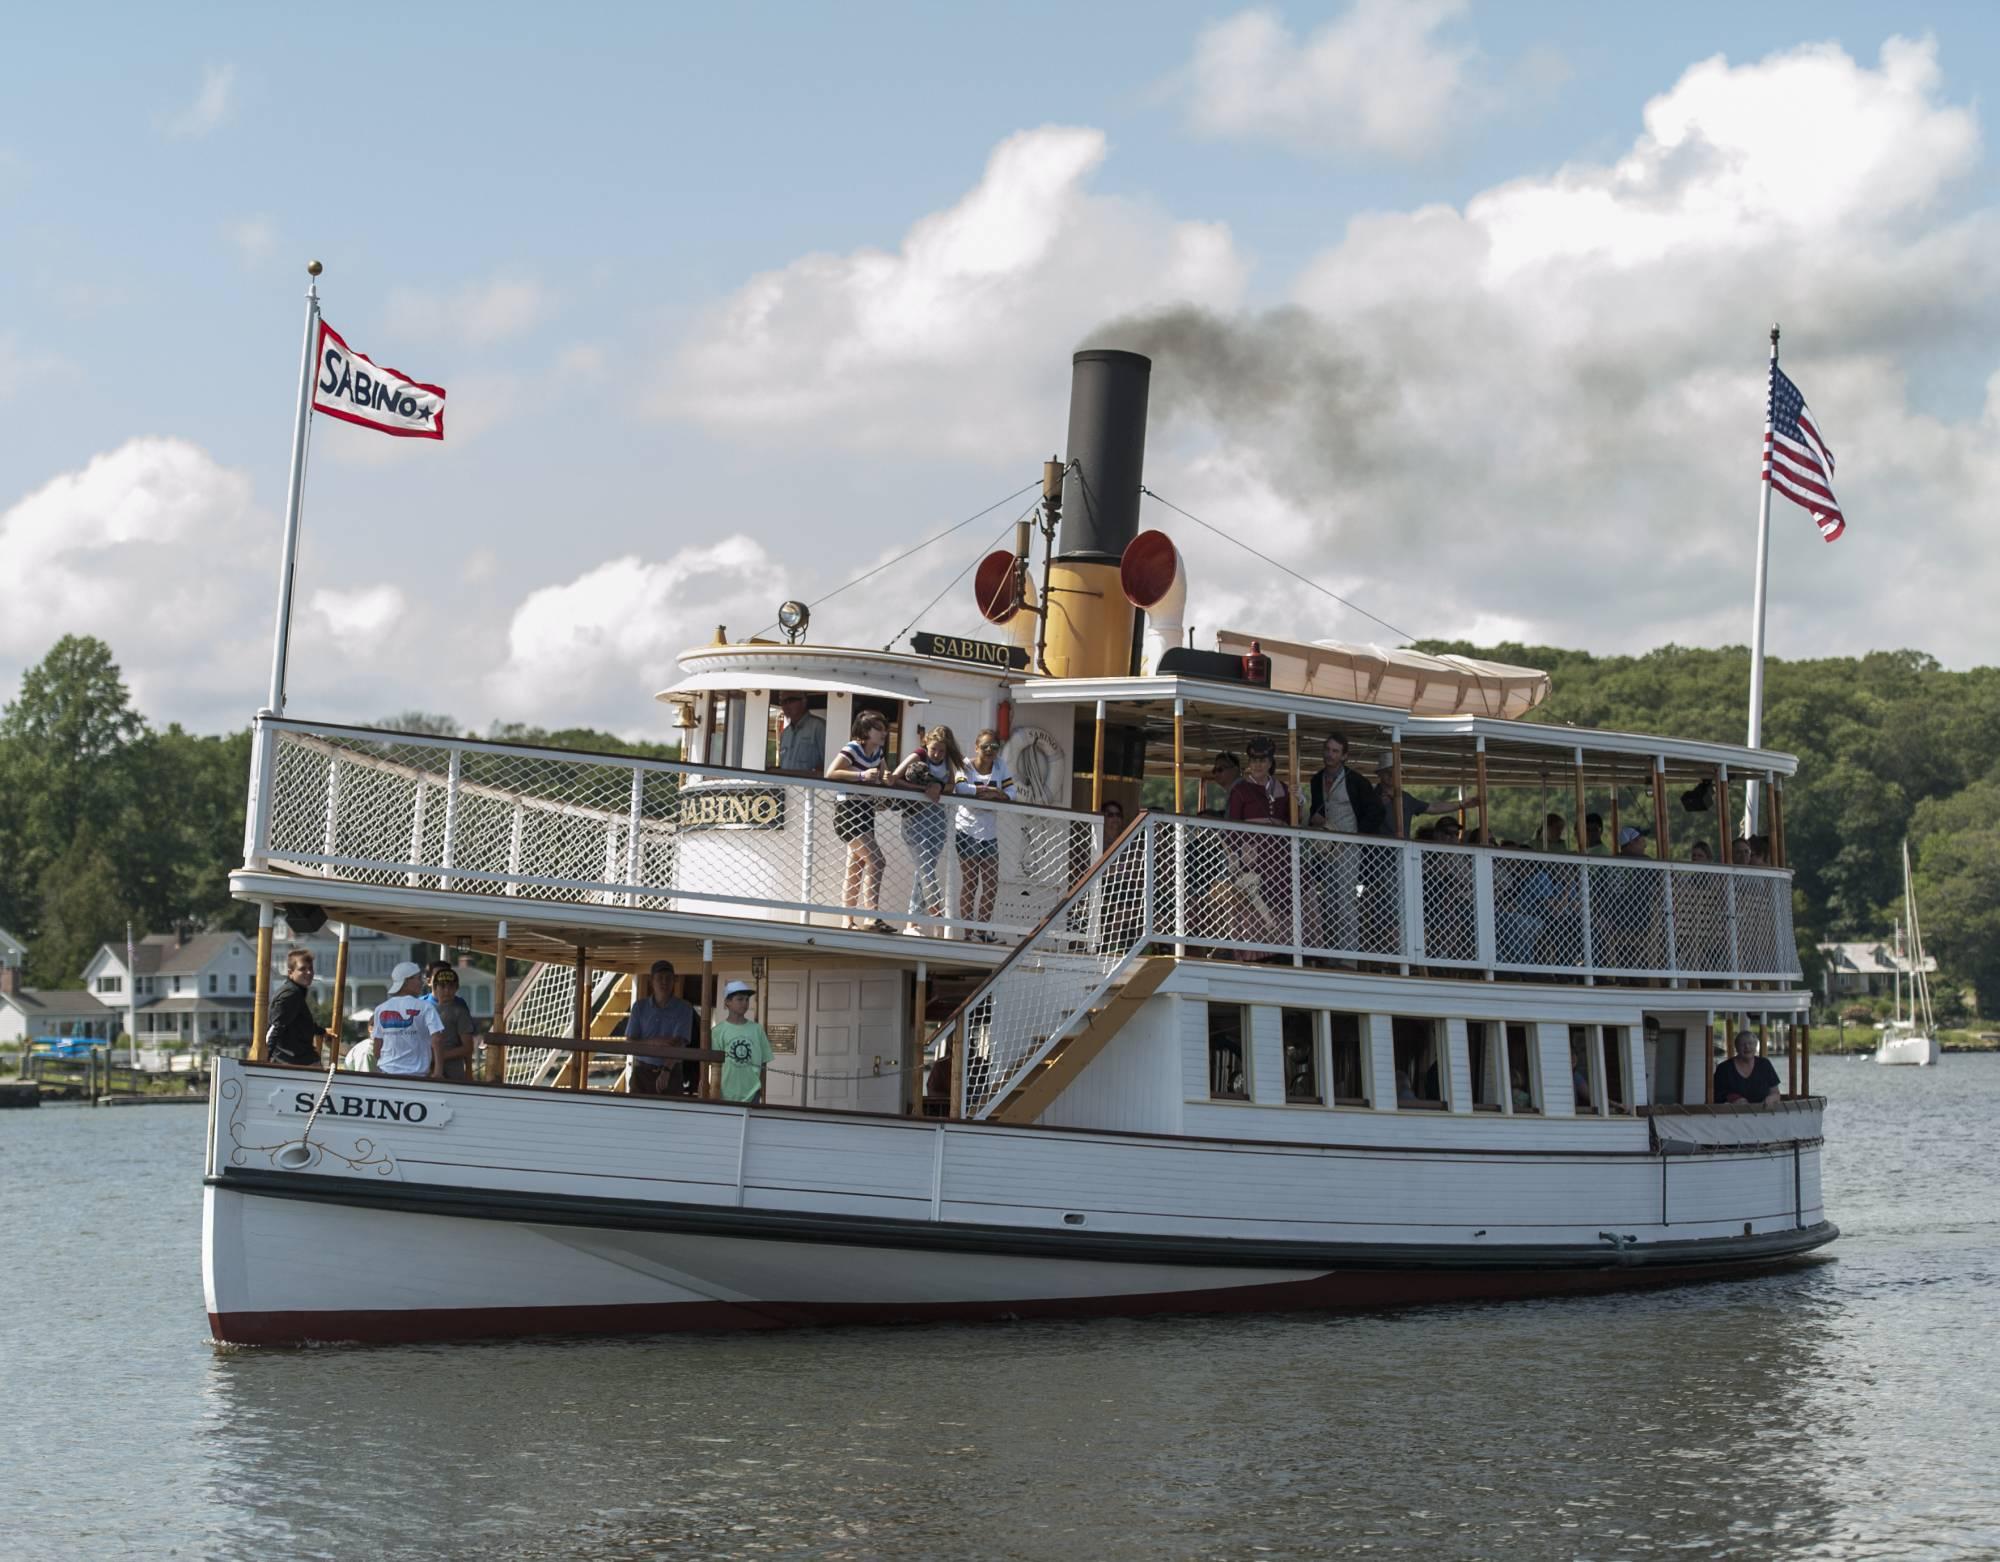 SS Sabino